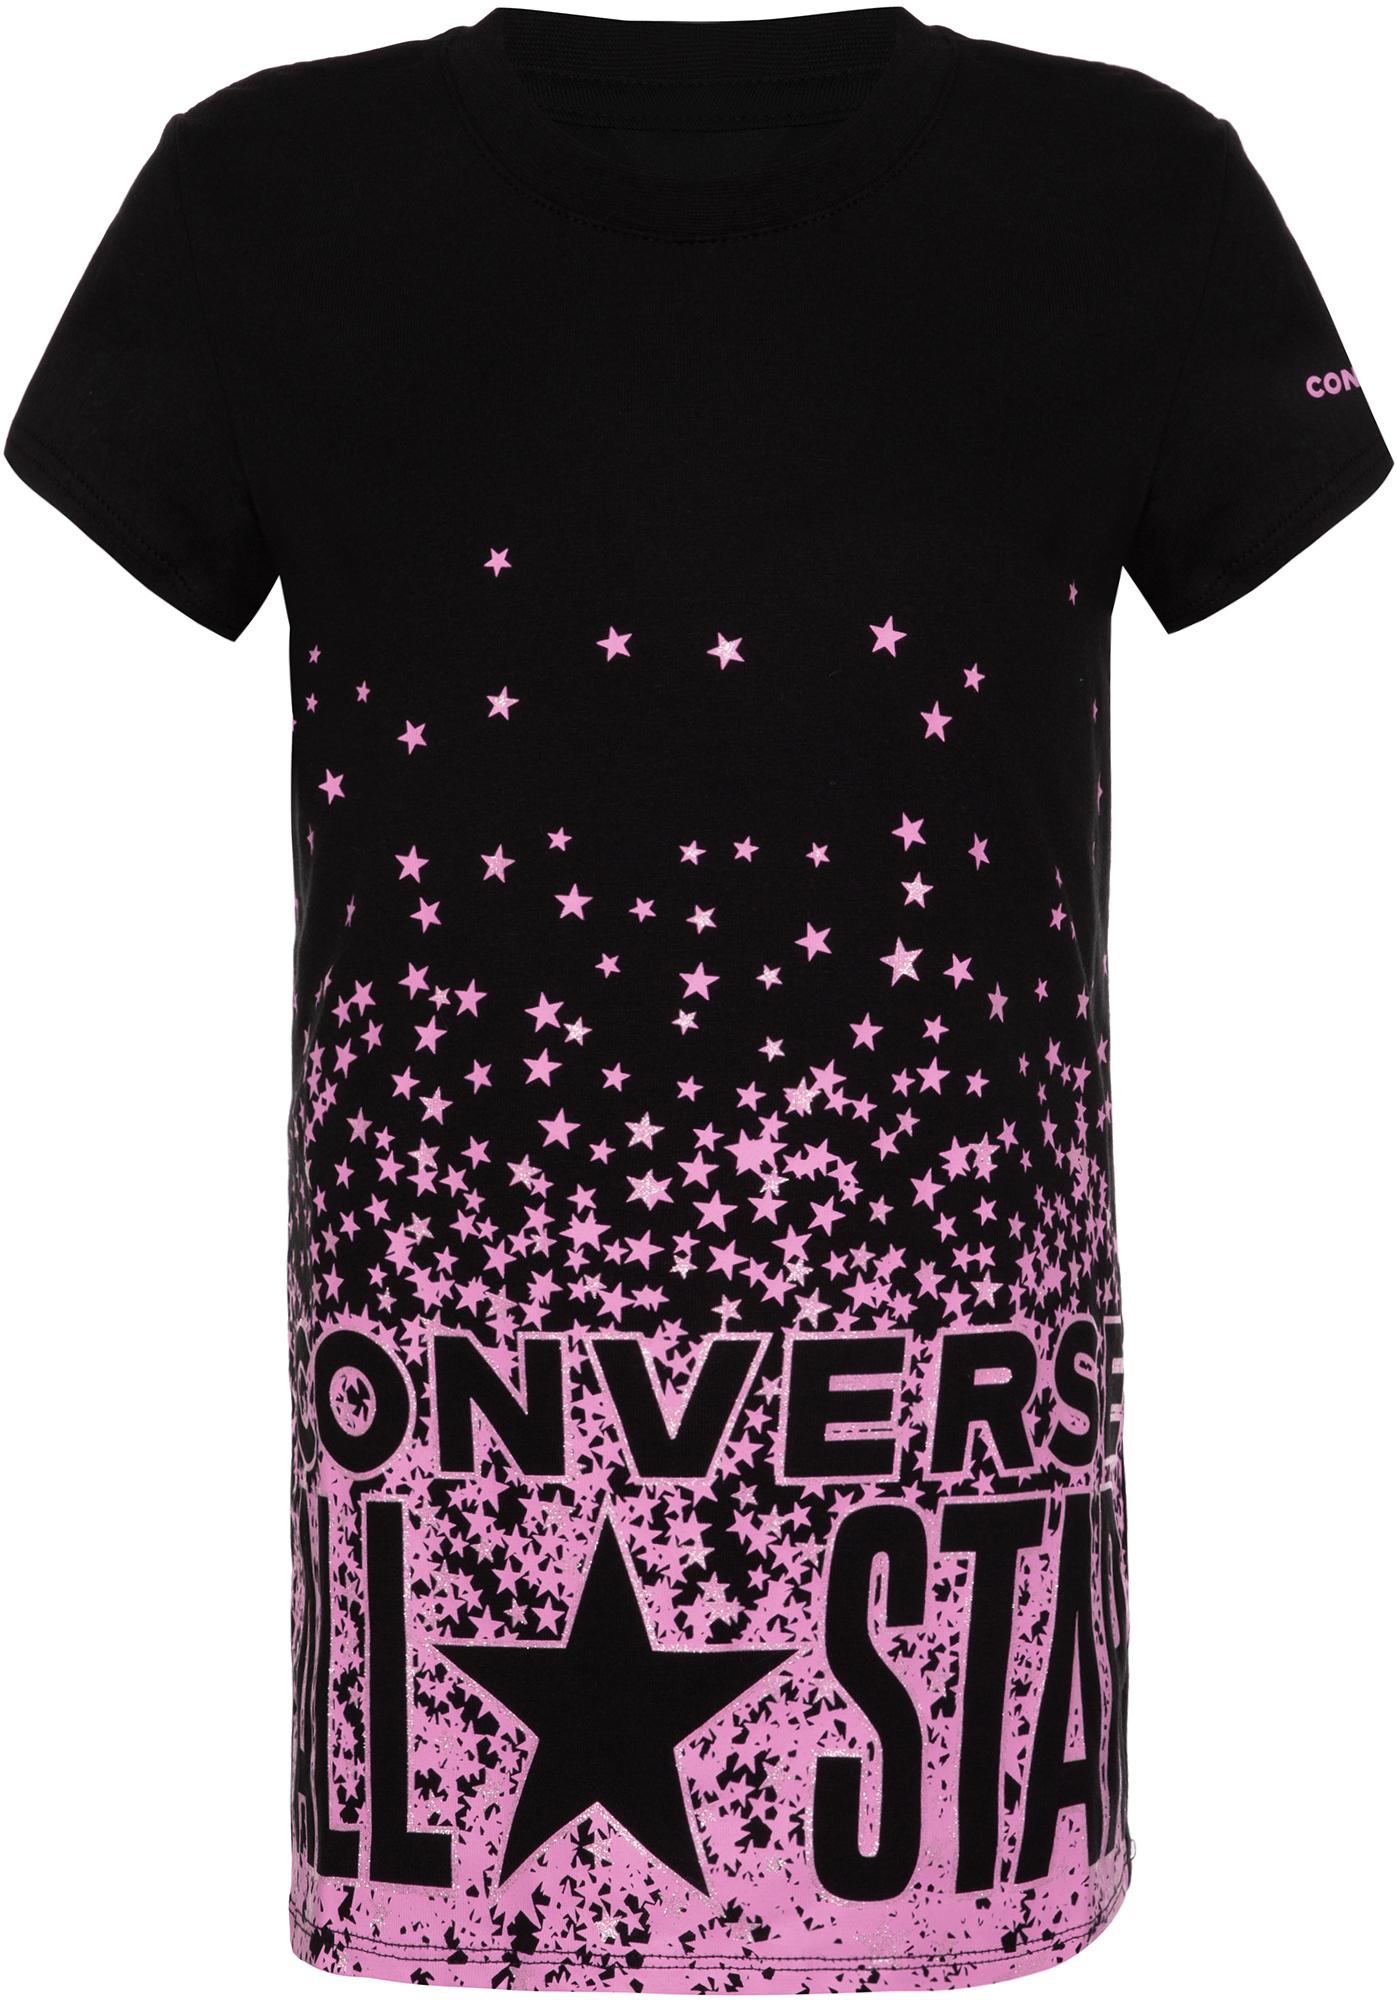 Фото - Converse Футболка для девочек Converse All Star Knockout Tee, размер 128 футболка converse tilted star chevron tee